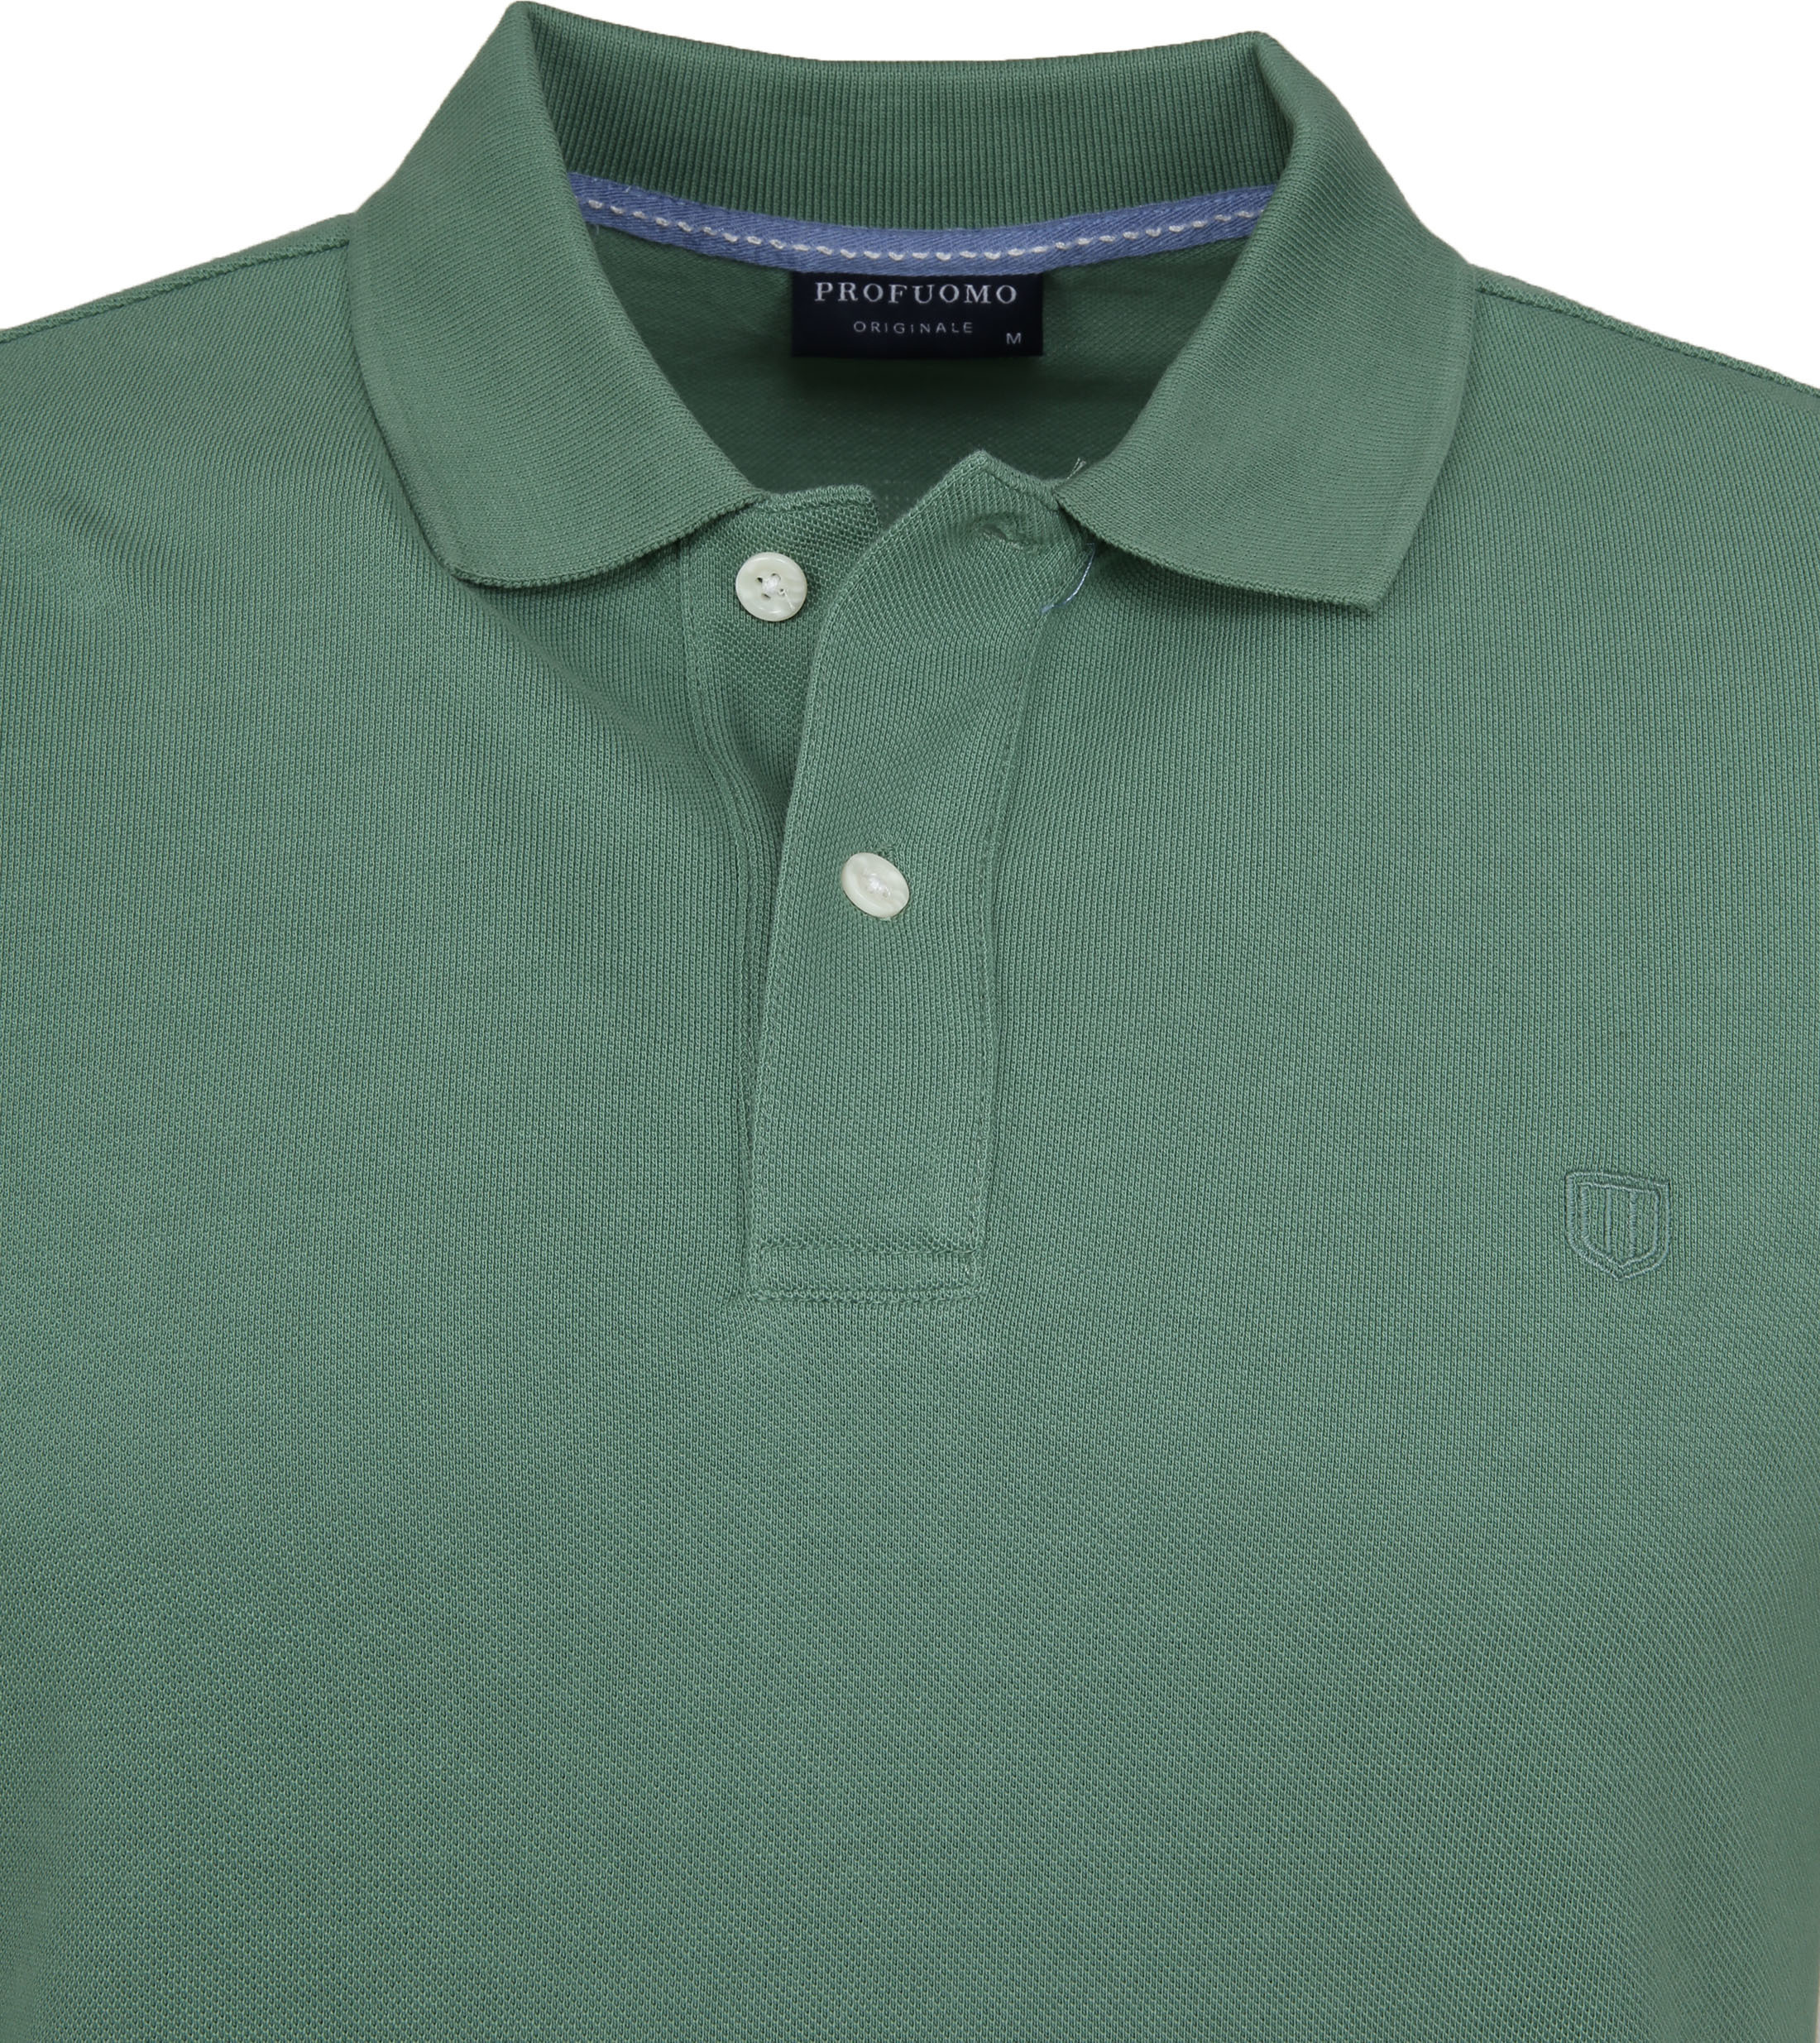 Profuomo Short Sleeve Poloshirt Grün foto 1